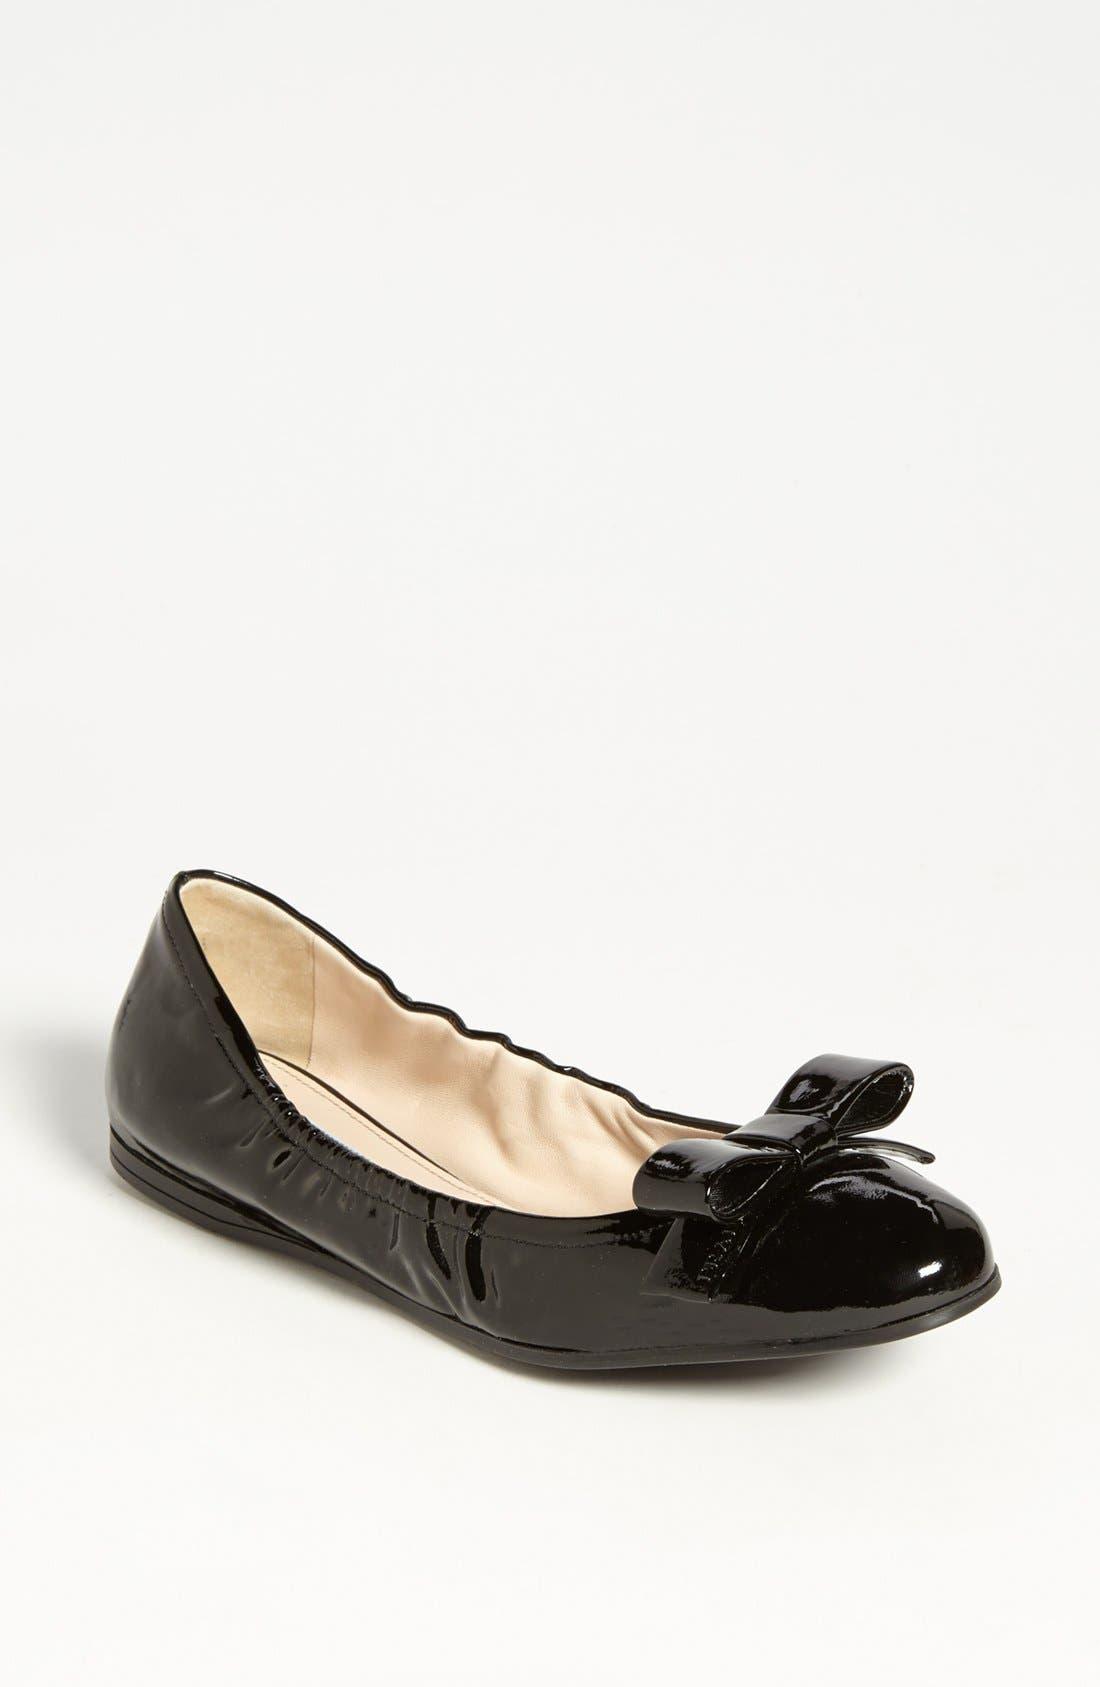 PRADA Bow Ballet Flat, Main, color, 001